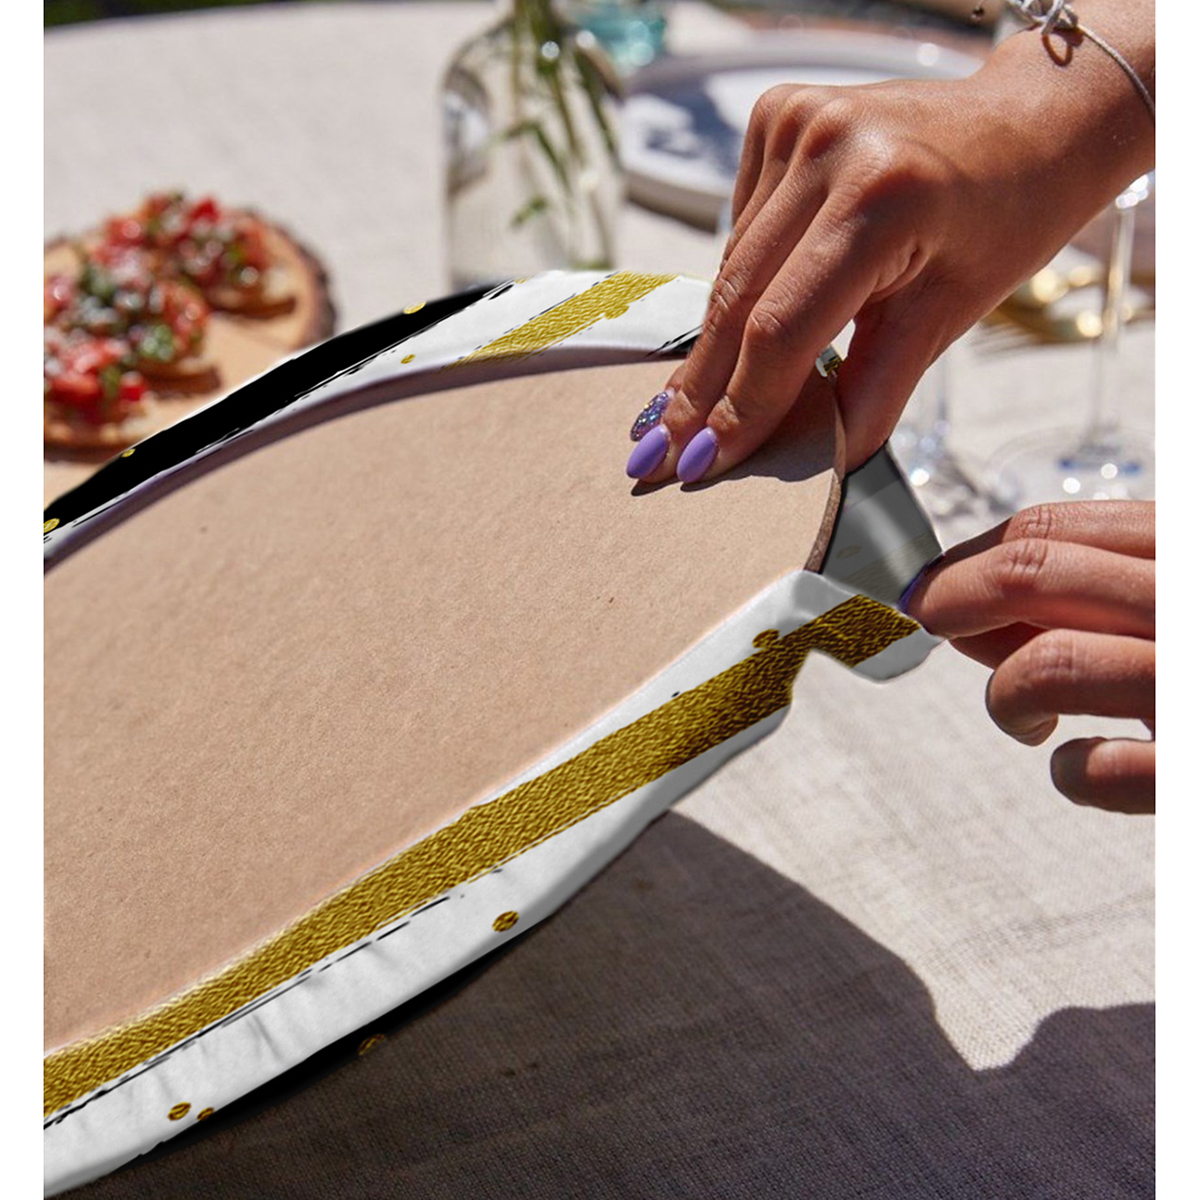 Realhomes Beyaz Zemin Üzerinde Gold Detaylı Siyah Yatay Çizgili 2'li Yuvarlak Servis Altlığı - Supla Realhomes